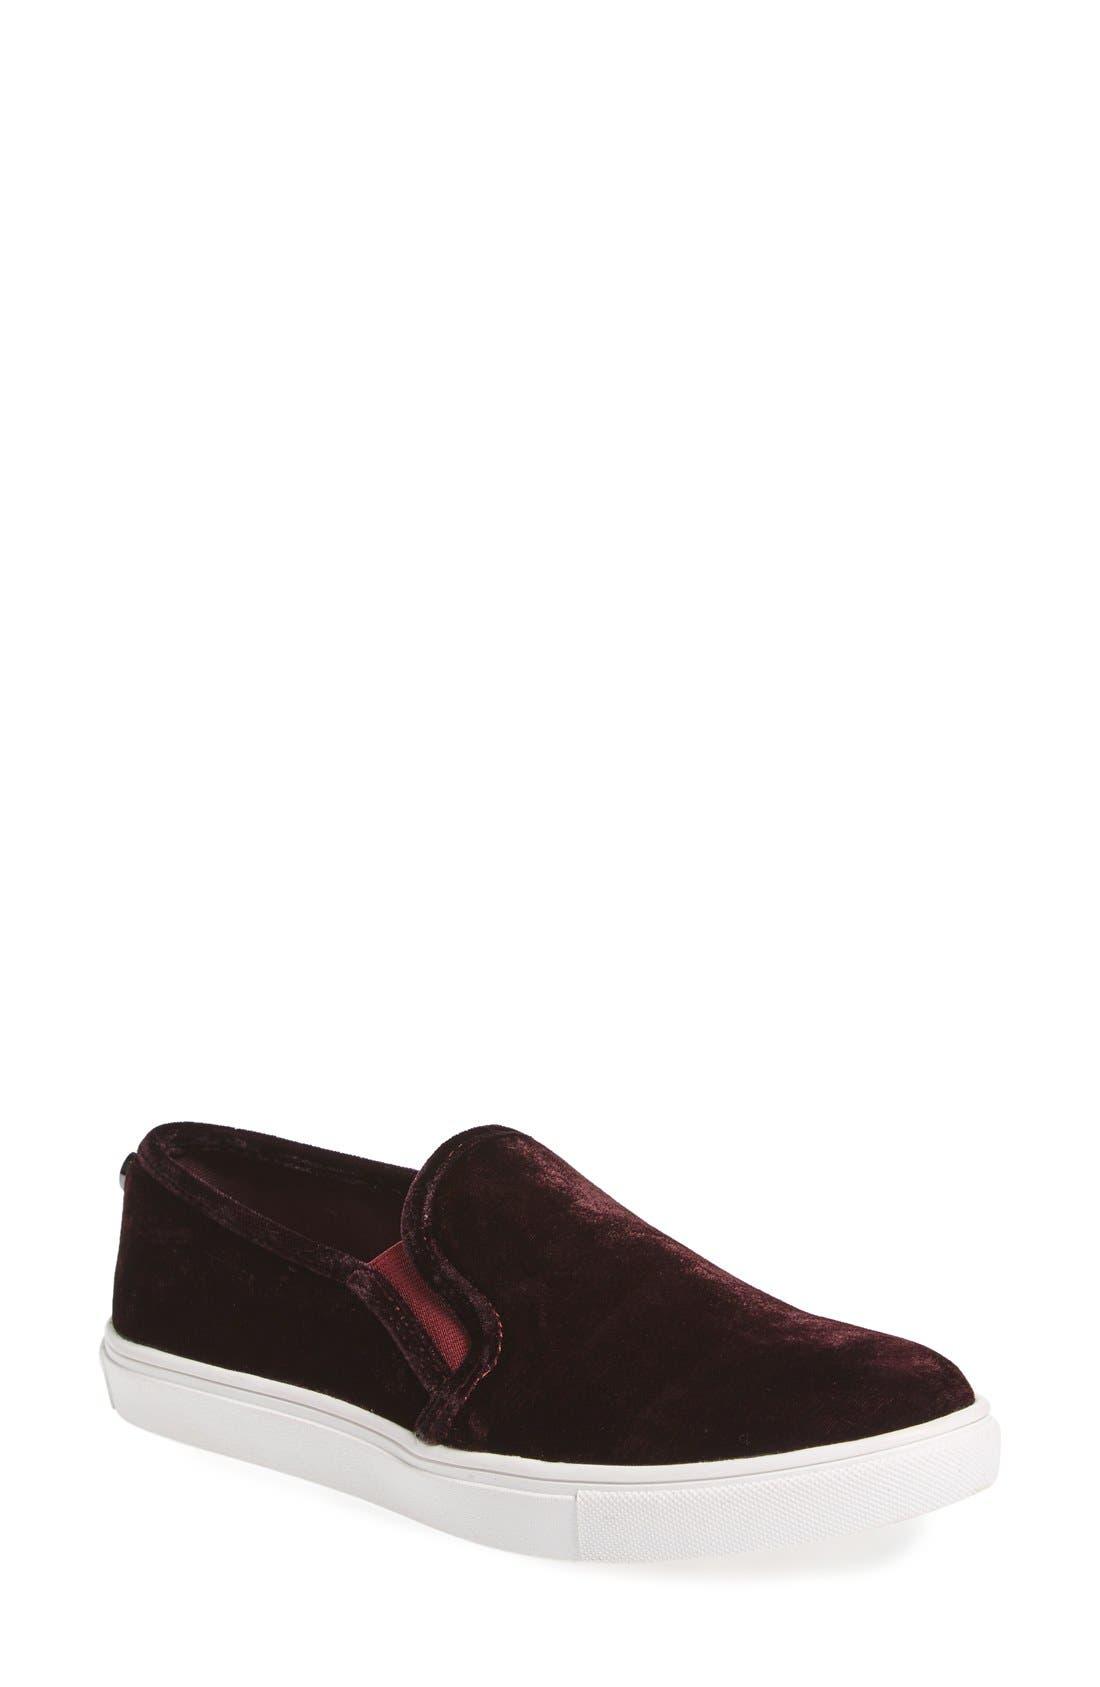 Ecntrcv Slip-On Sneaker,                             Main thumbnail 6, color,